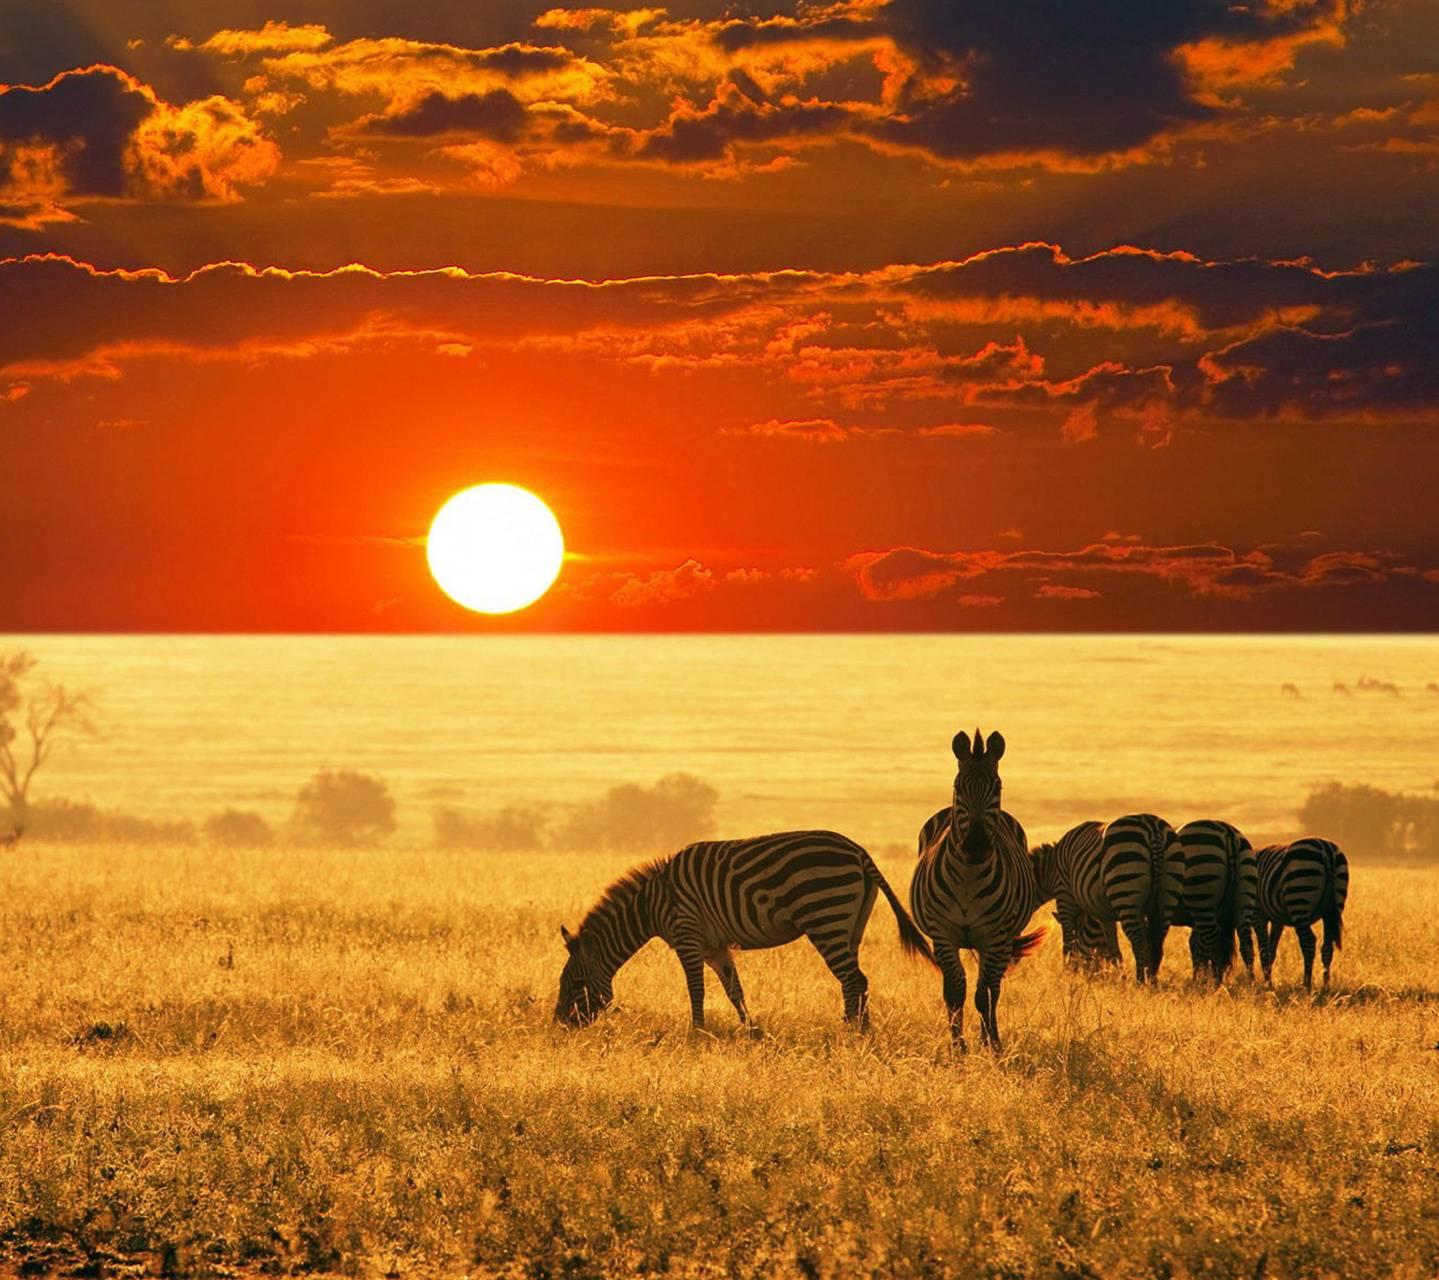 Sunrise And Zebras